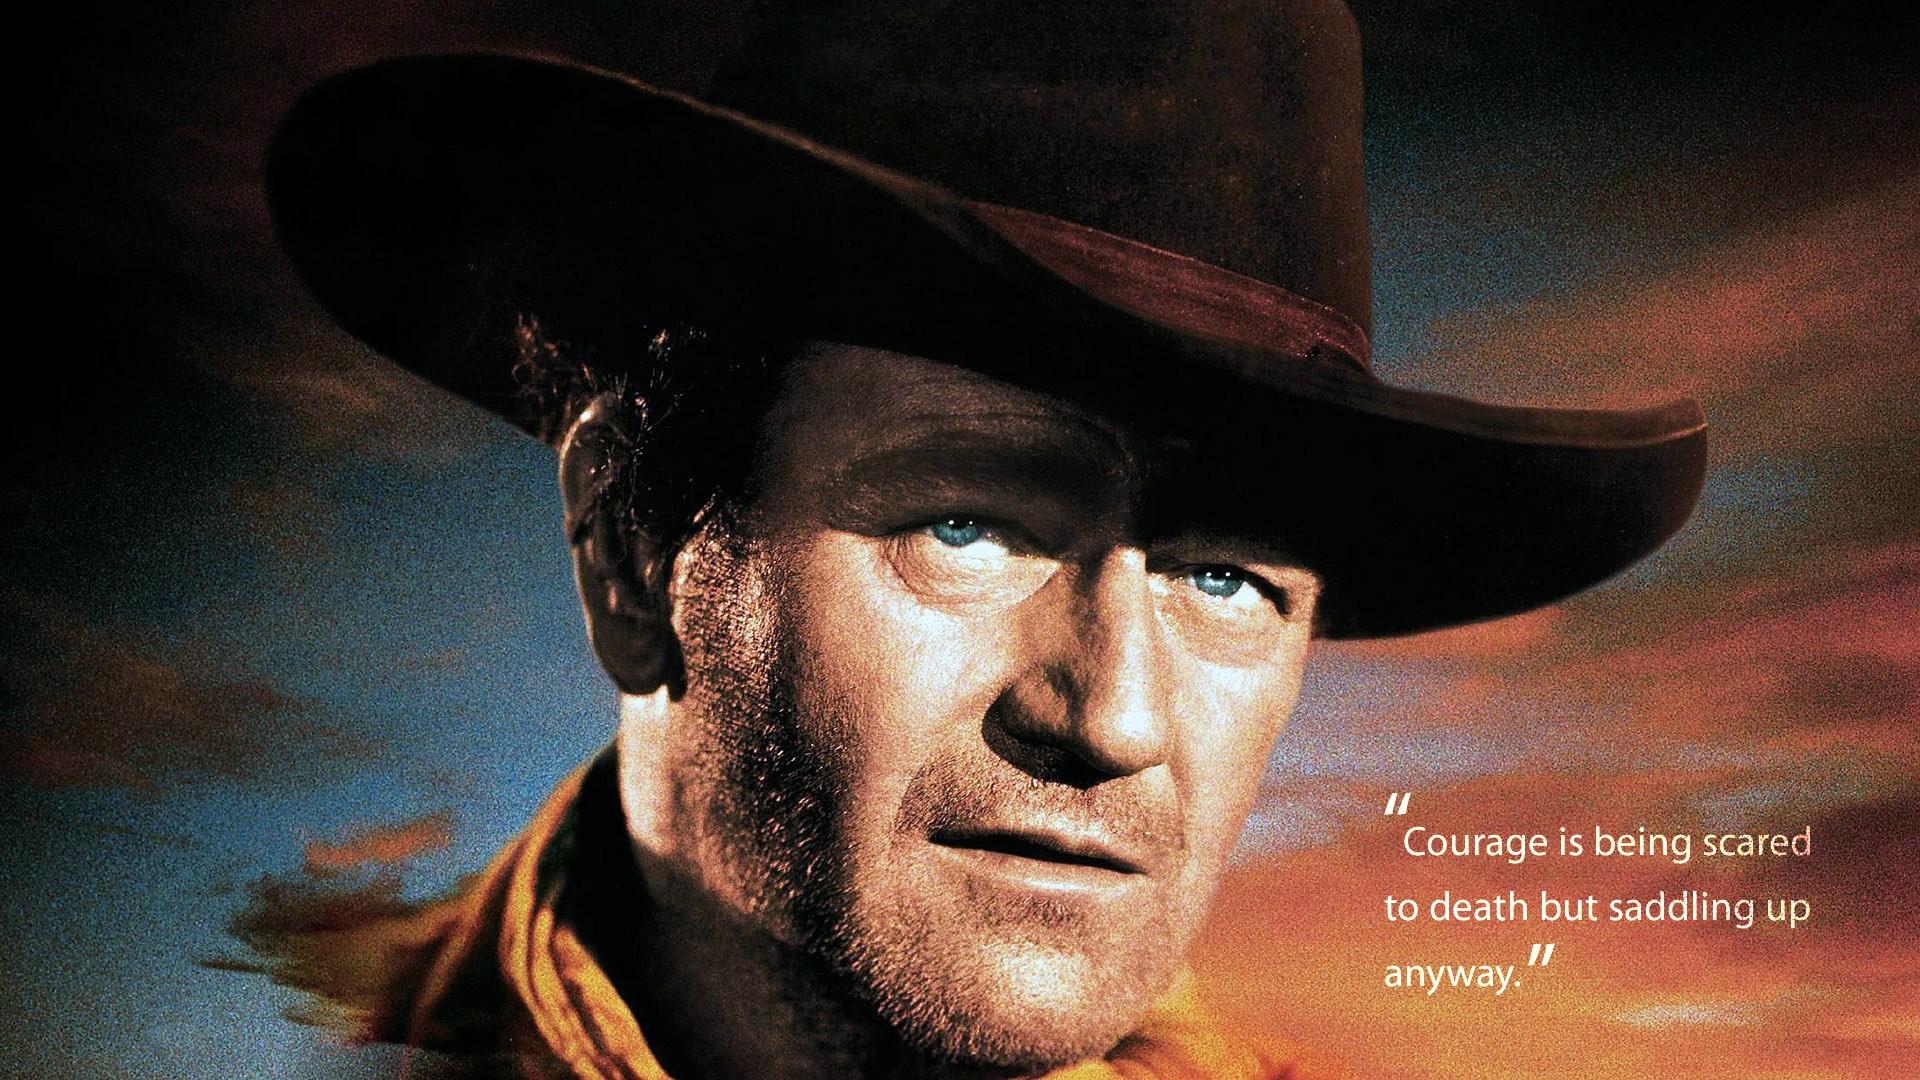 John Wayne Actor Images western movies Desktop Image   Picture for 1920x1080